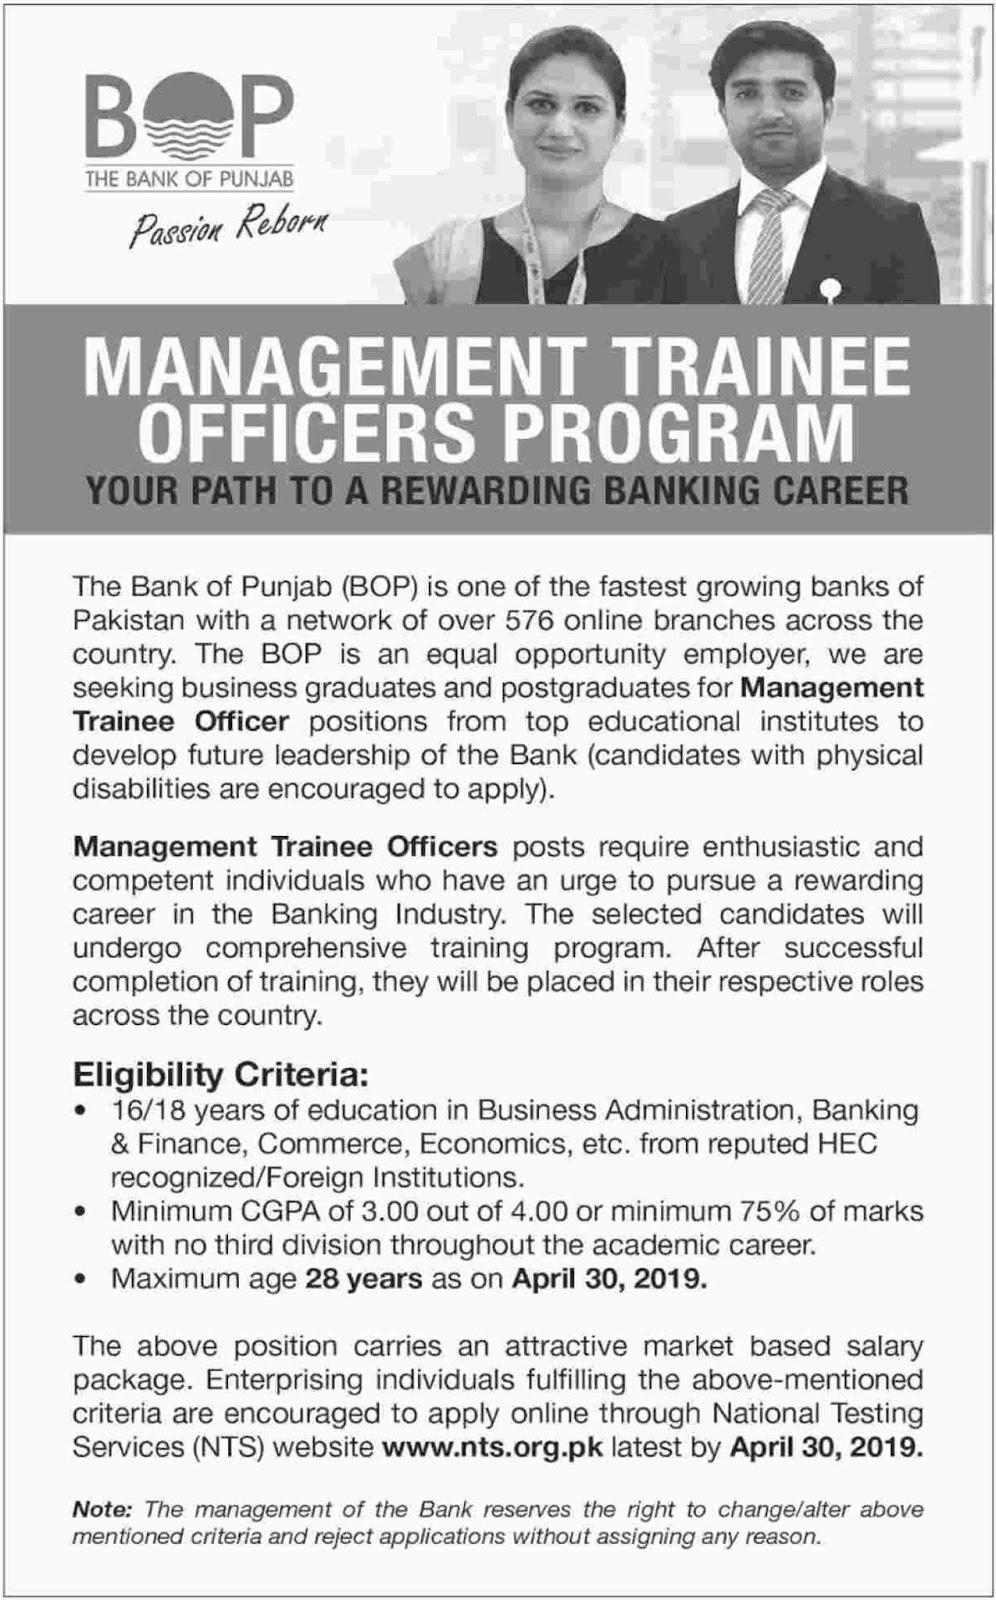 Bank of Punjab BOP Jobs 2019 For Management Trainee Officers Program